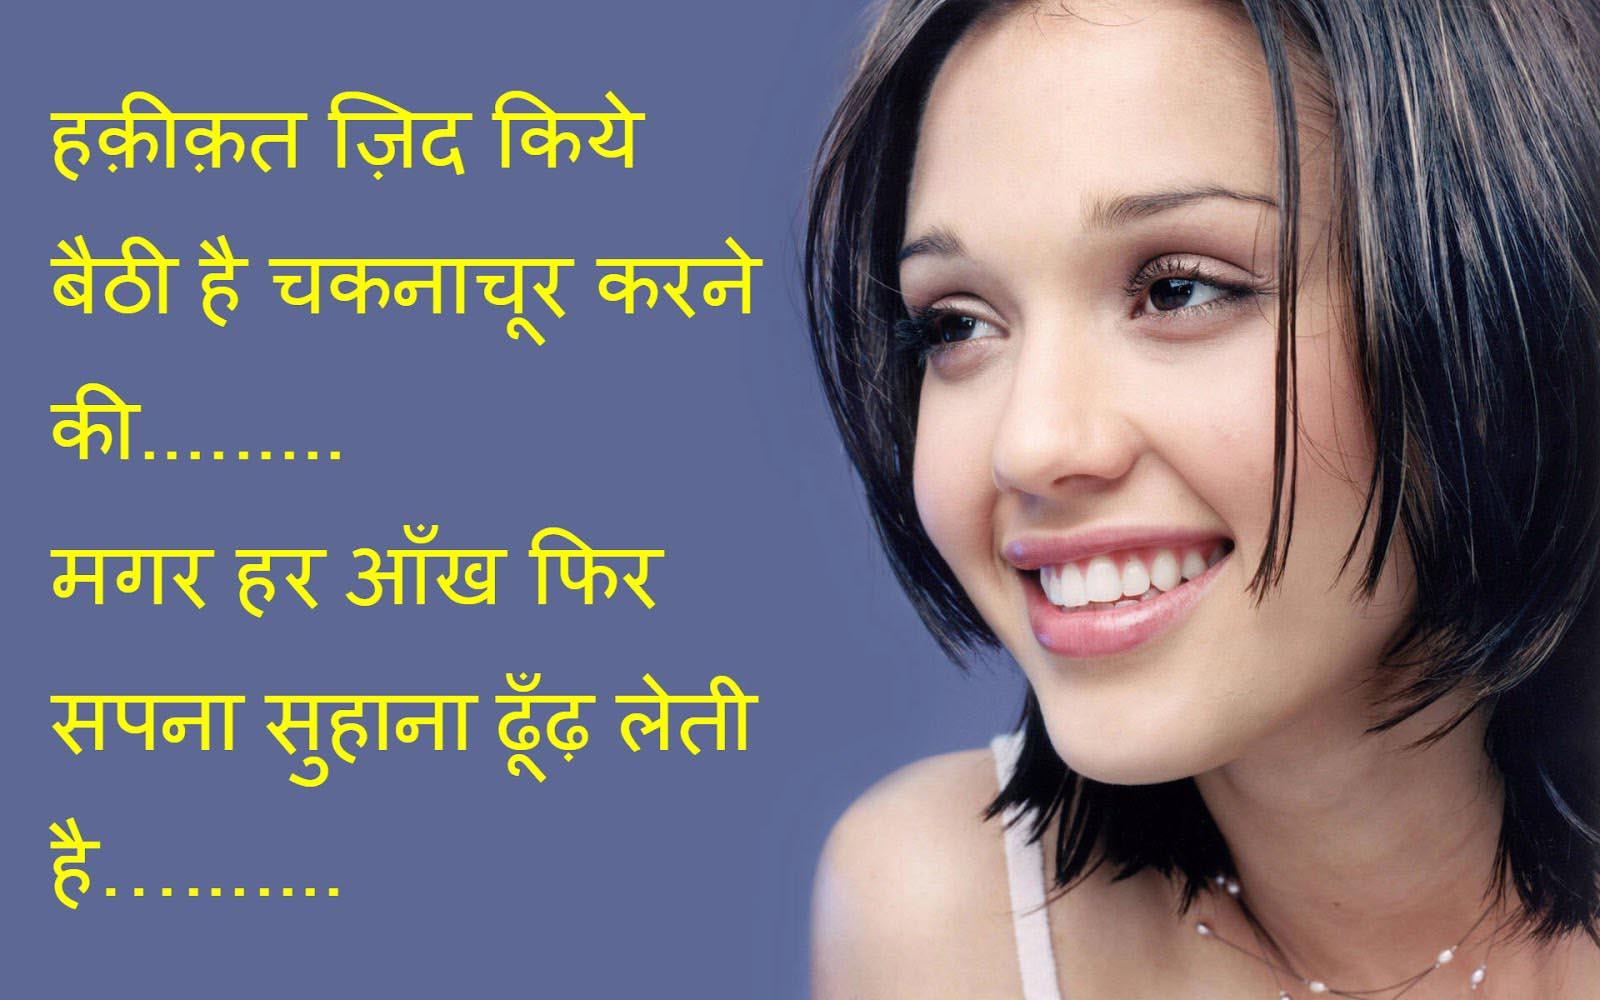 Hindi shayari girl wafai image whatsapp-dp